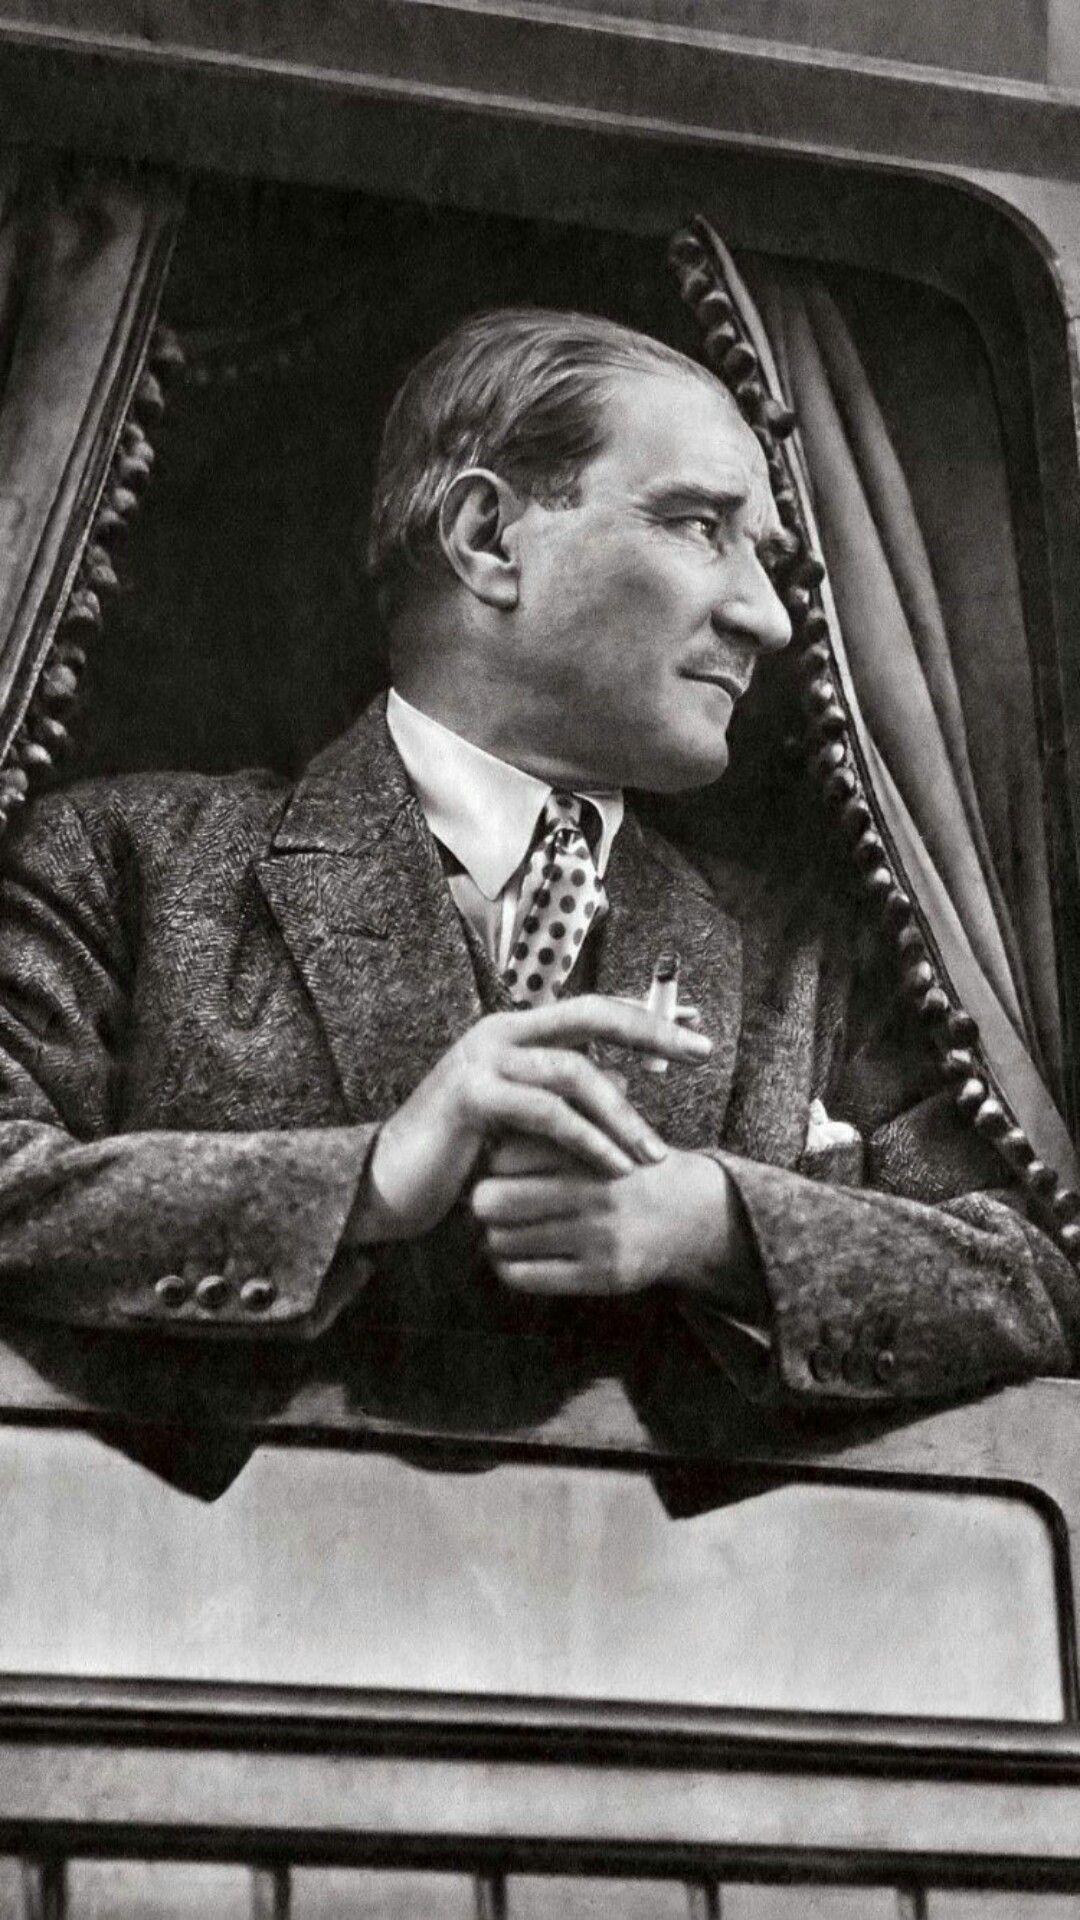 Gazi Mustafa Kemal Ataturk Tarihci Duvar Kagitlari Poertre Resimleri